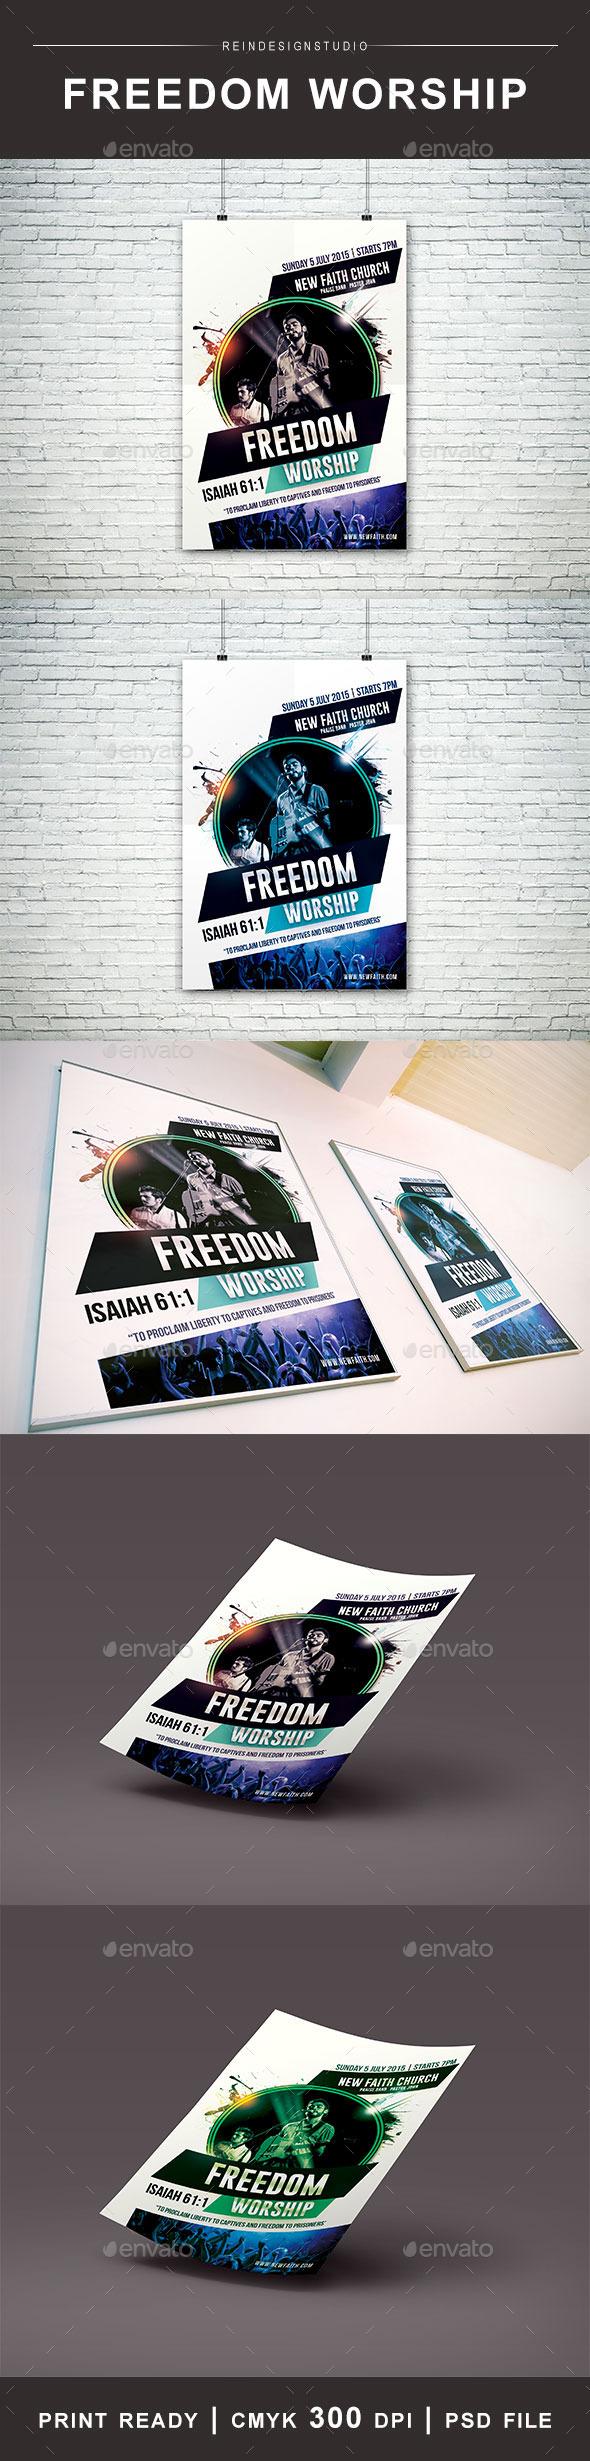 Freedom Worship Church Flyer - Church Flyers